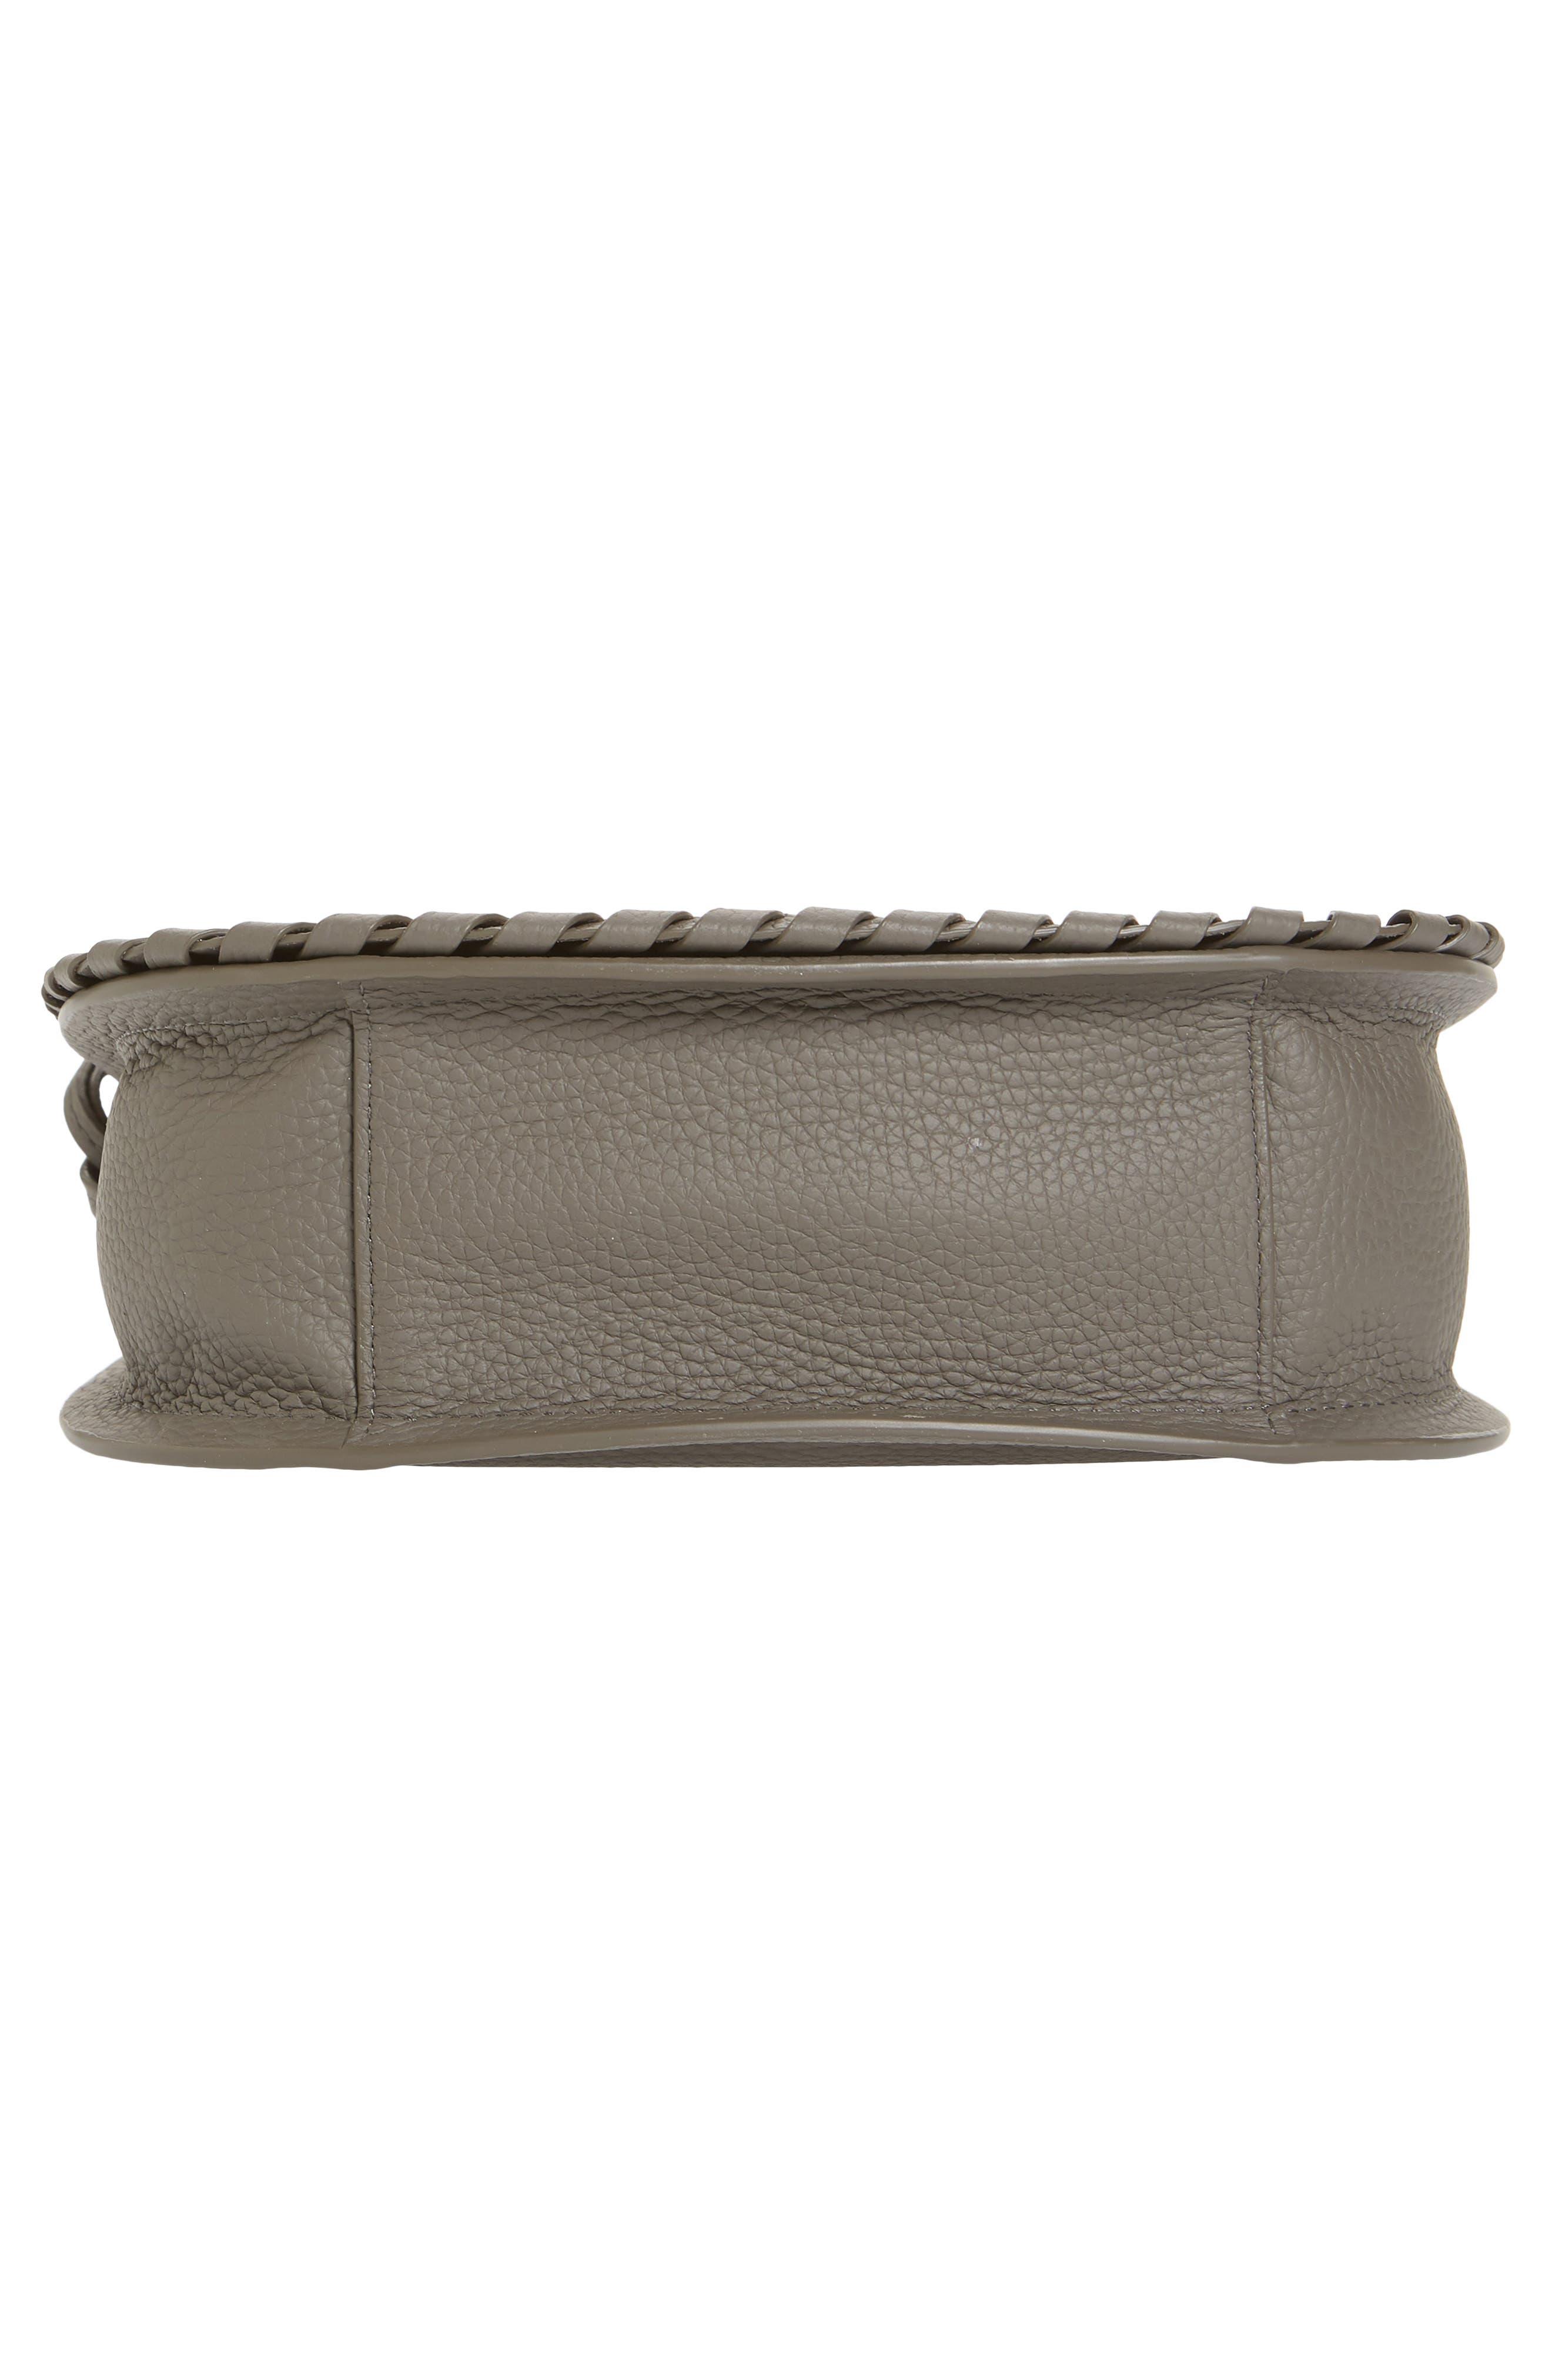 ALLSAINTS, Mori Leather Crossbody Bag, Alternate thumbnail 6, color, STORM GREY